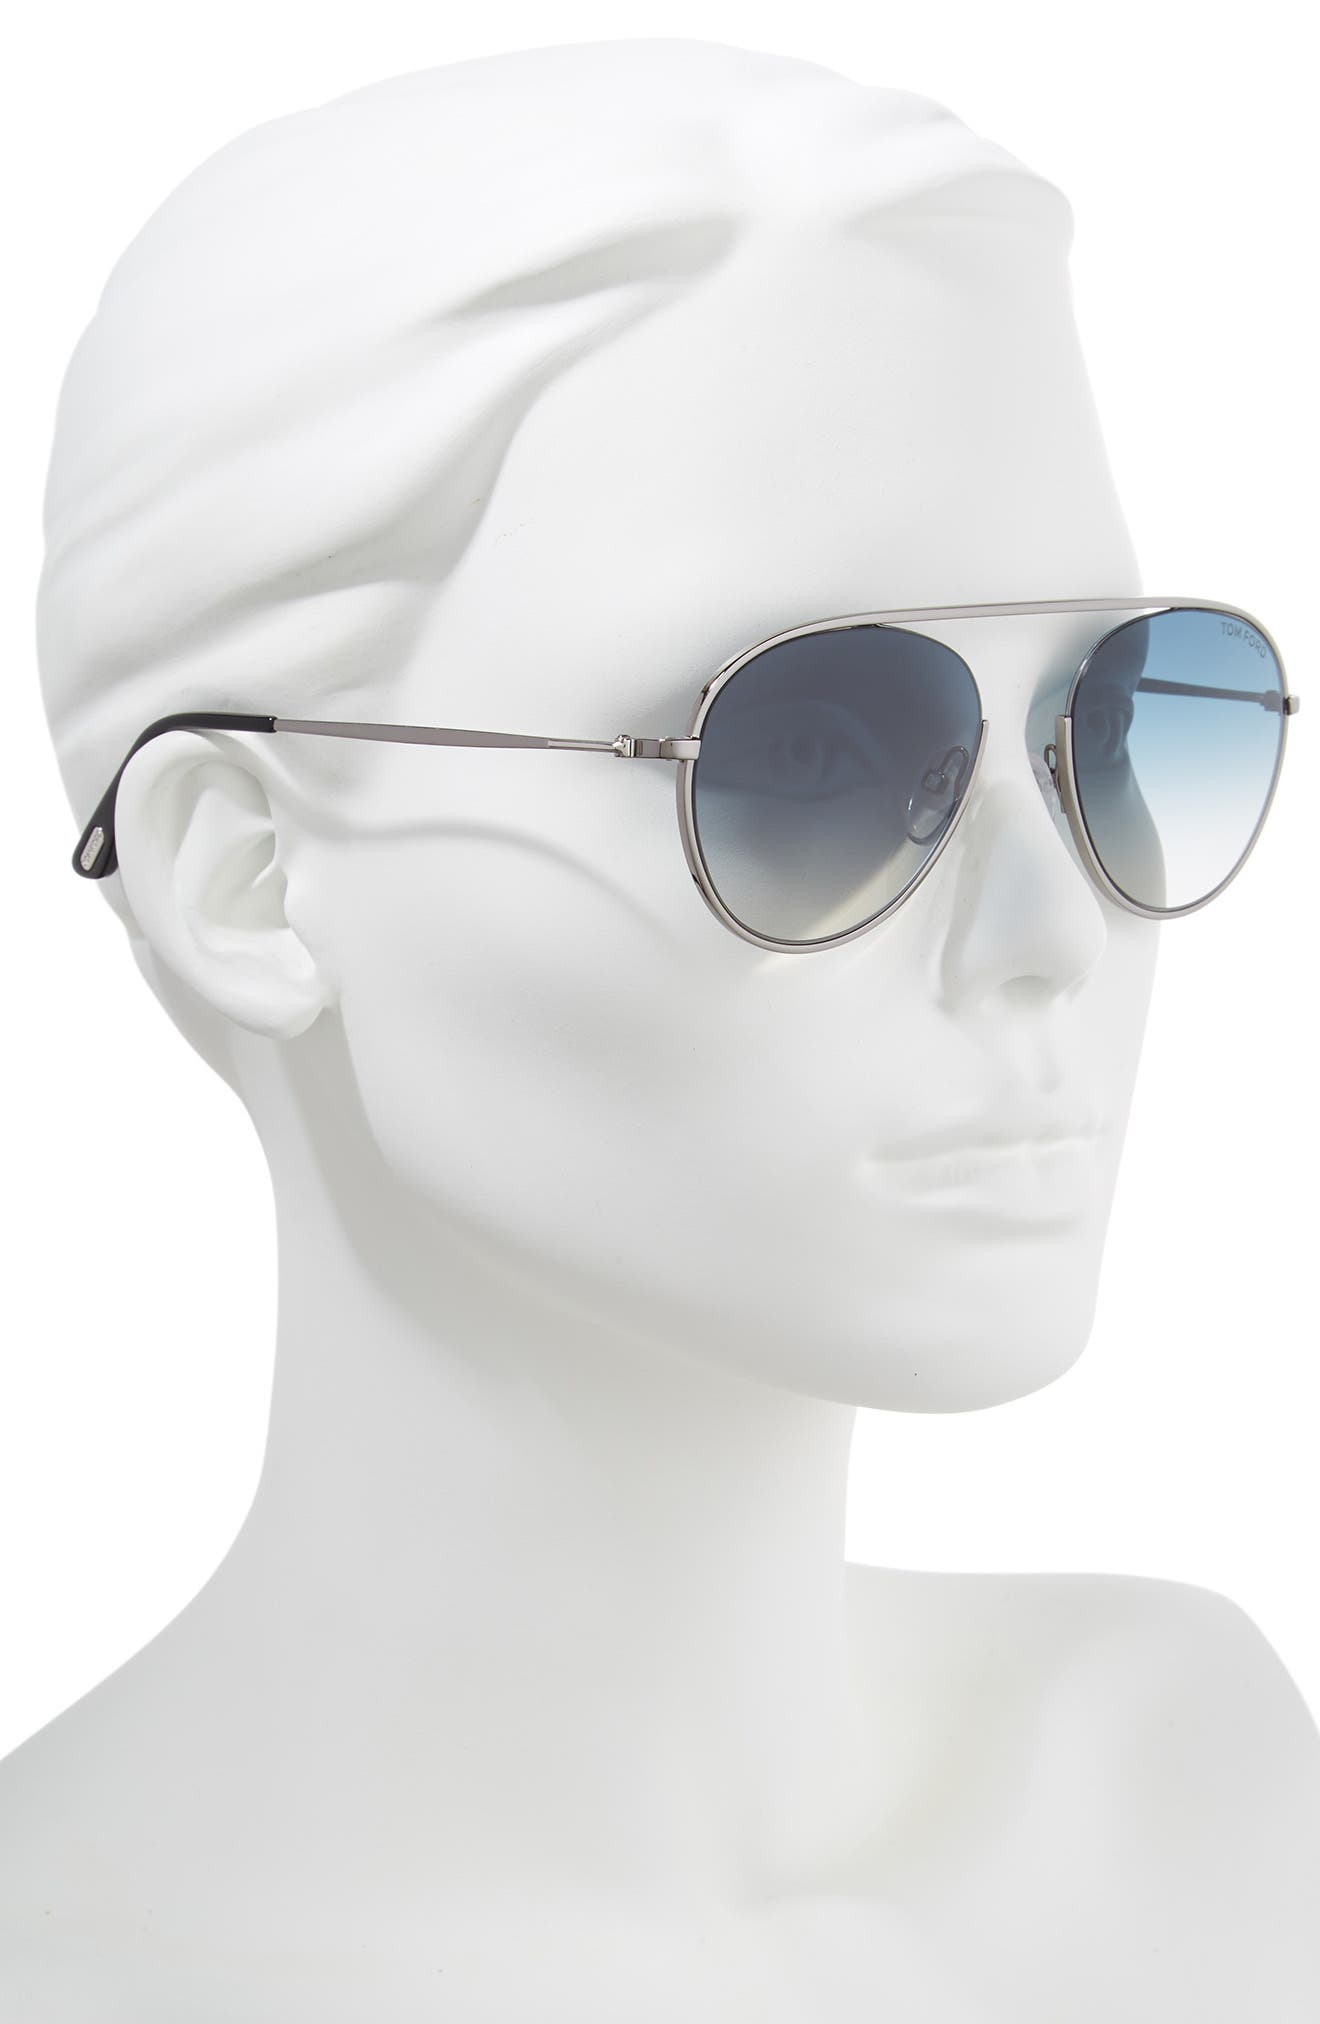 Keith 55mm Metal Aviator Sunglasses,                             Alternate thumbnail 2, color,                             Shiny Gumetal/ Gradient Blue